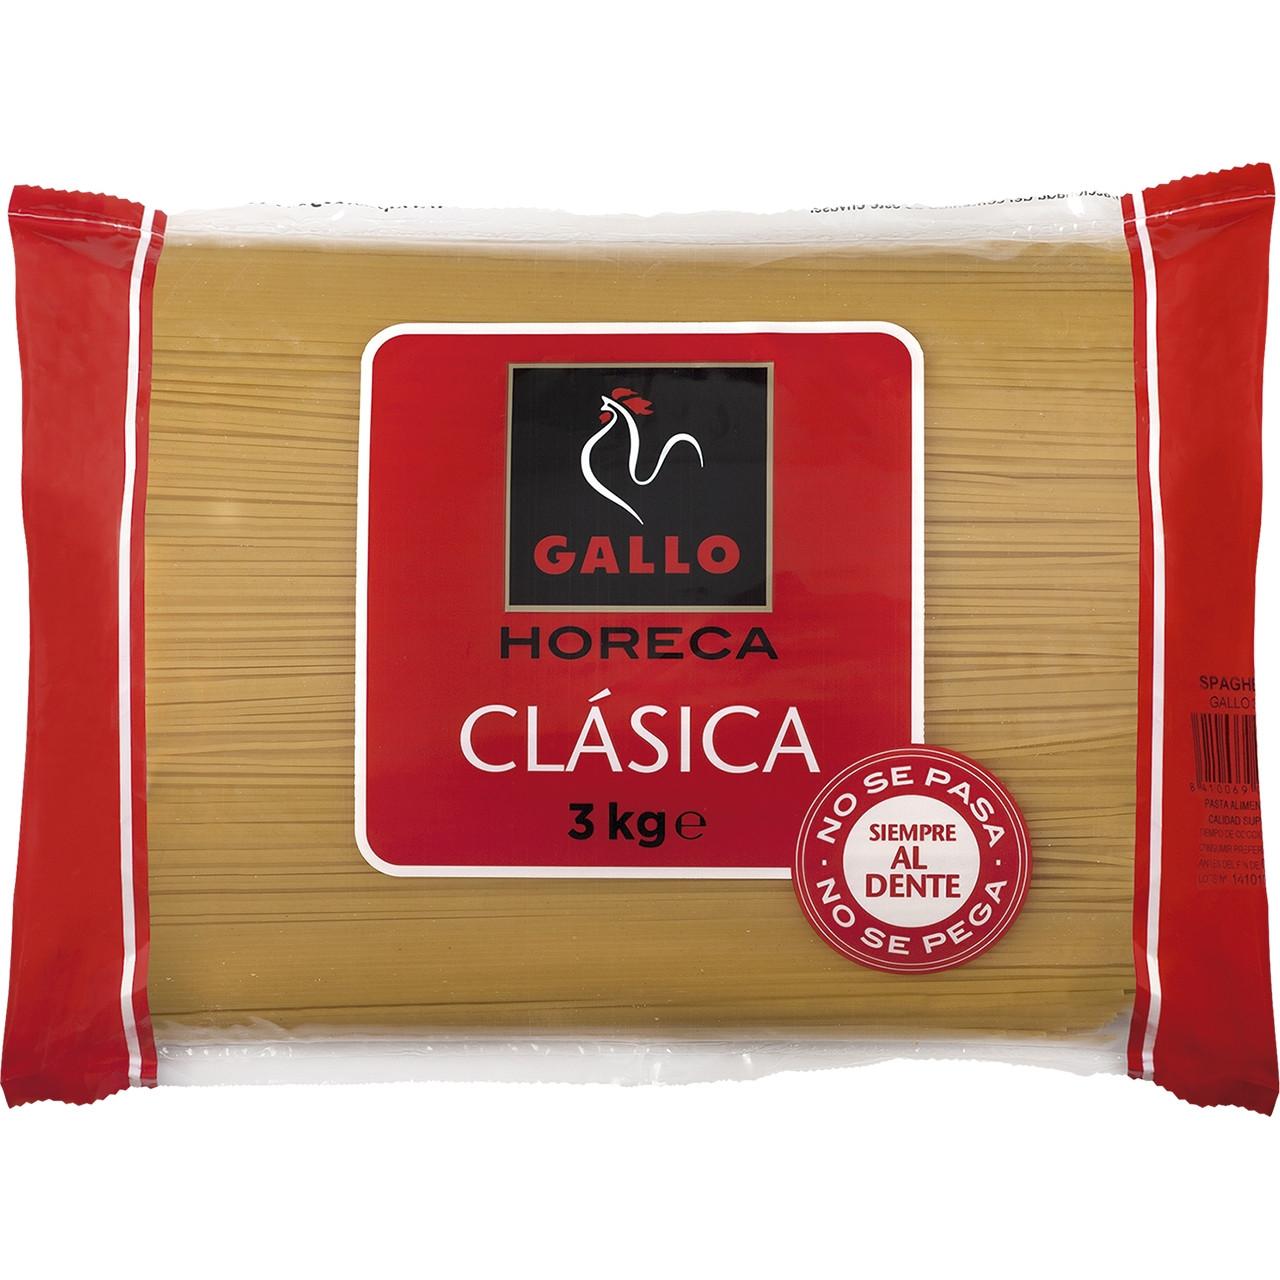 Espagueti nº 3 hostaleria Gallo